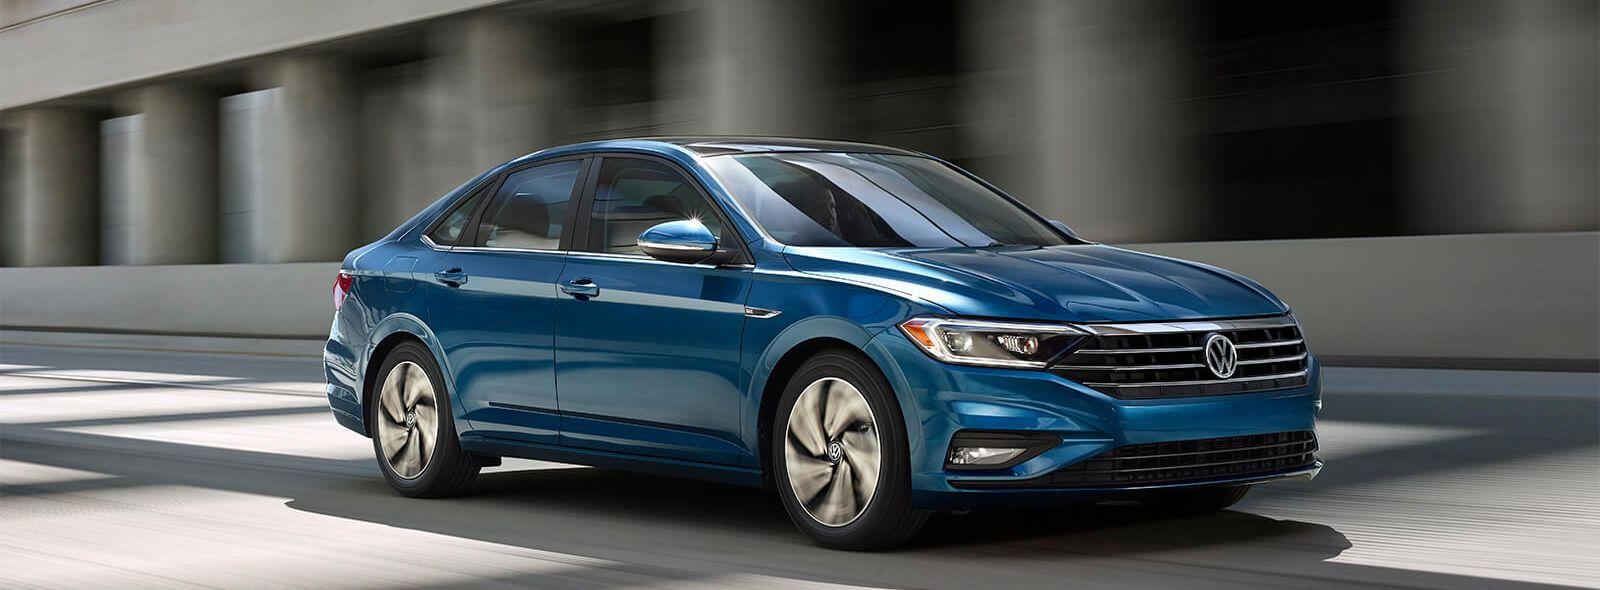 2019 Volkswagen Jetta for Sale near Atlantic City, NJ